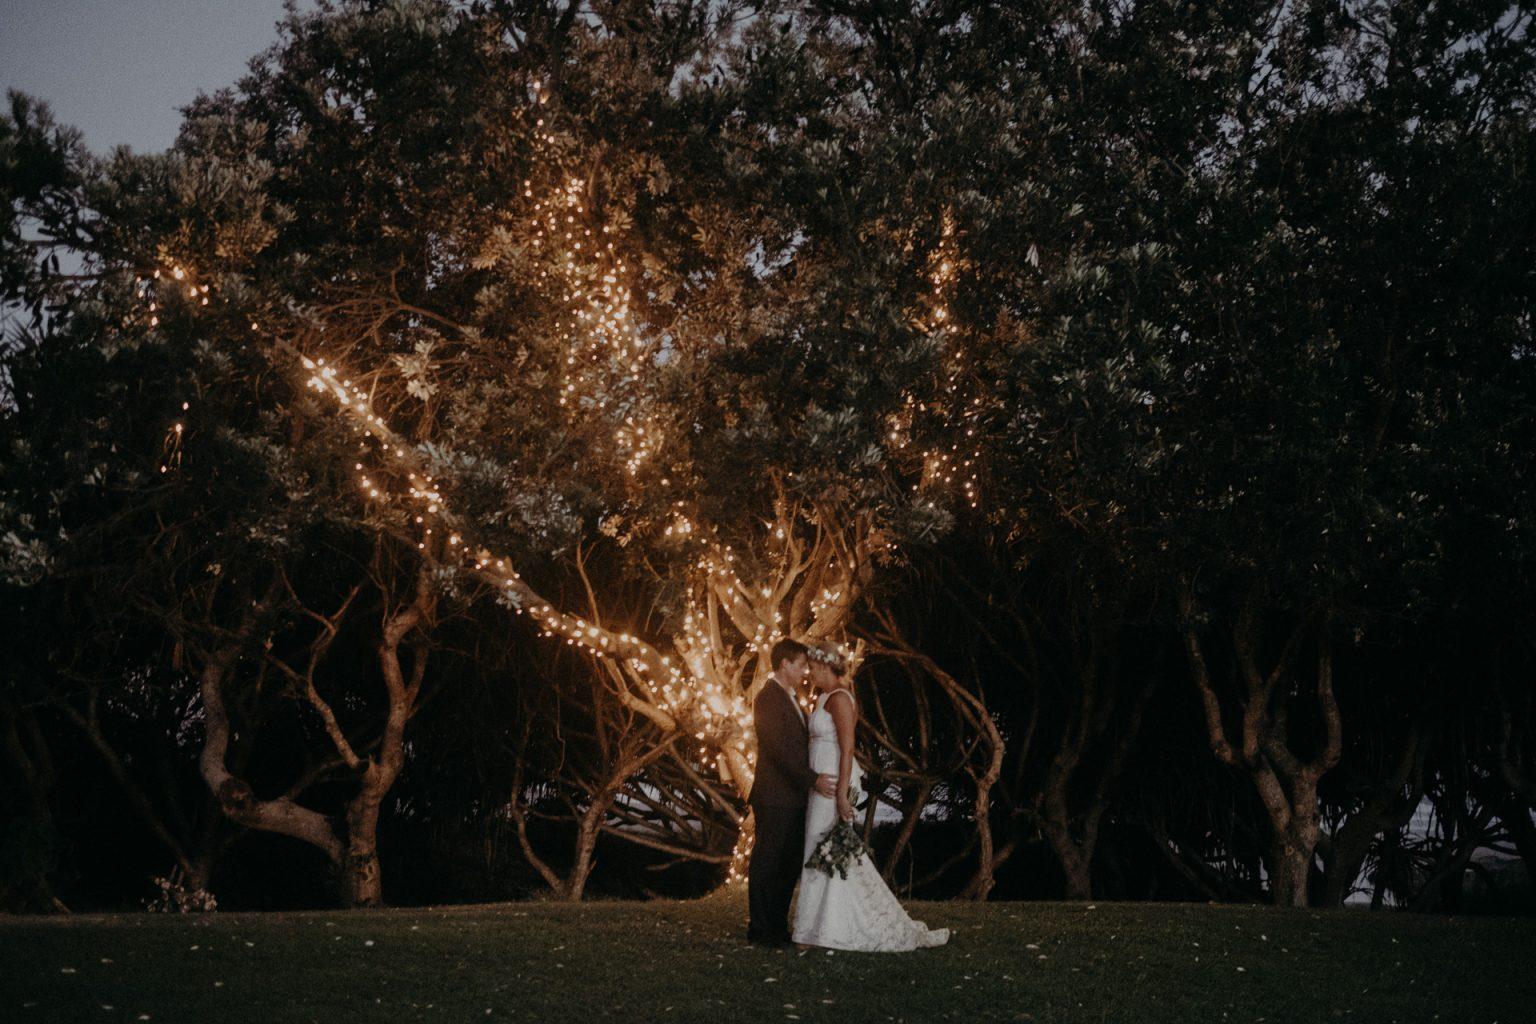 bride and groom cabaret beach long grass tree fairy lights